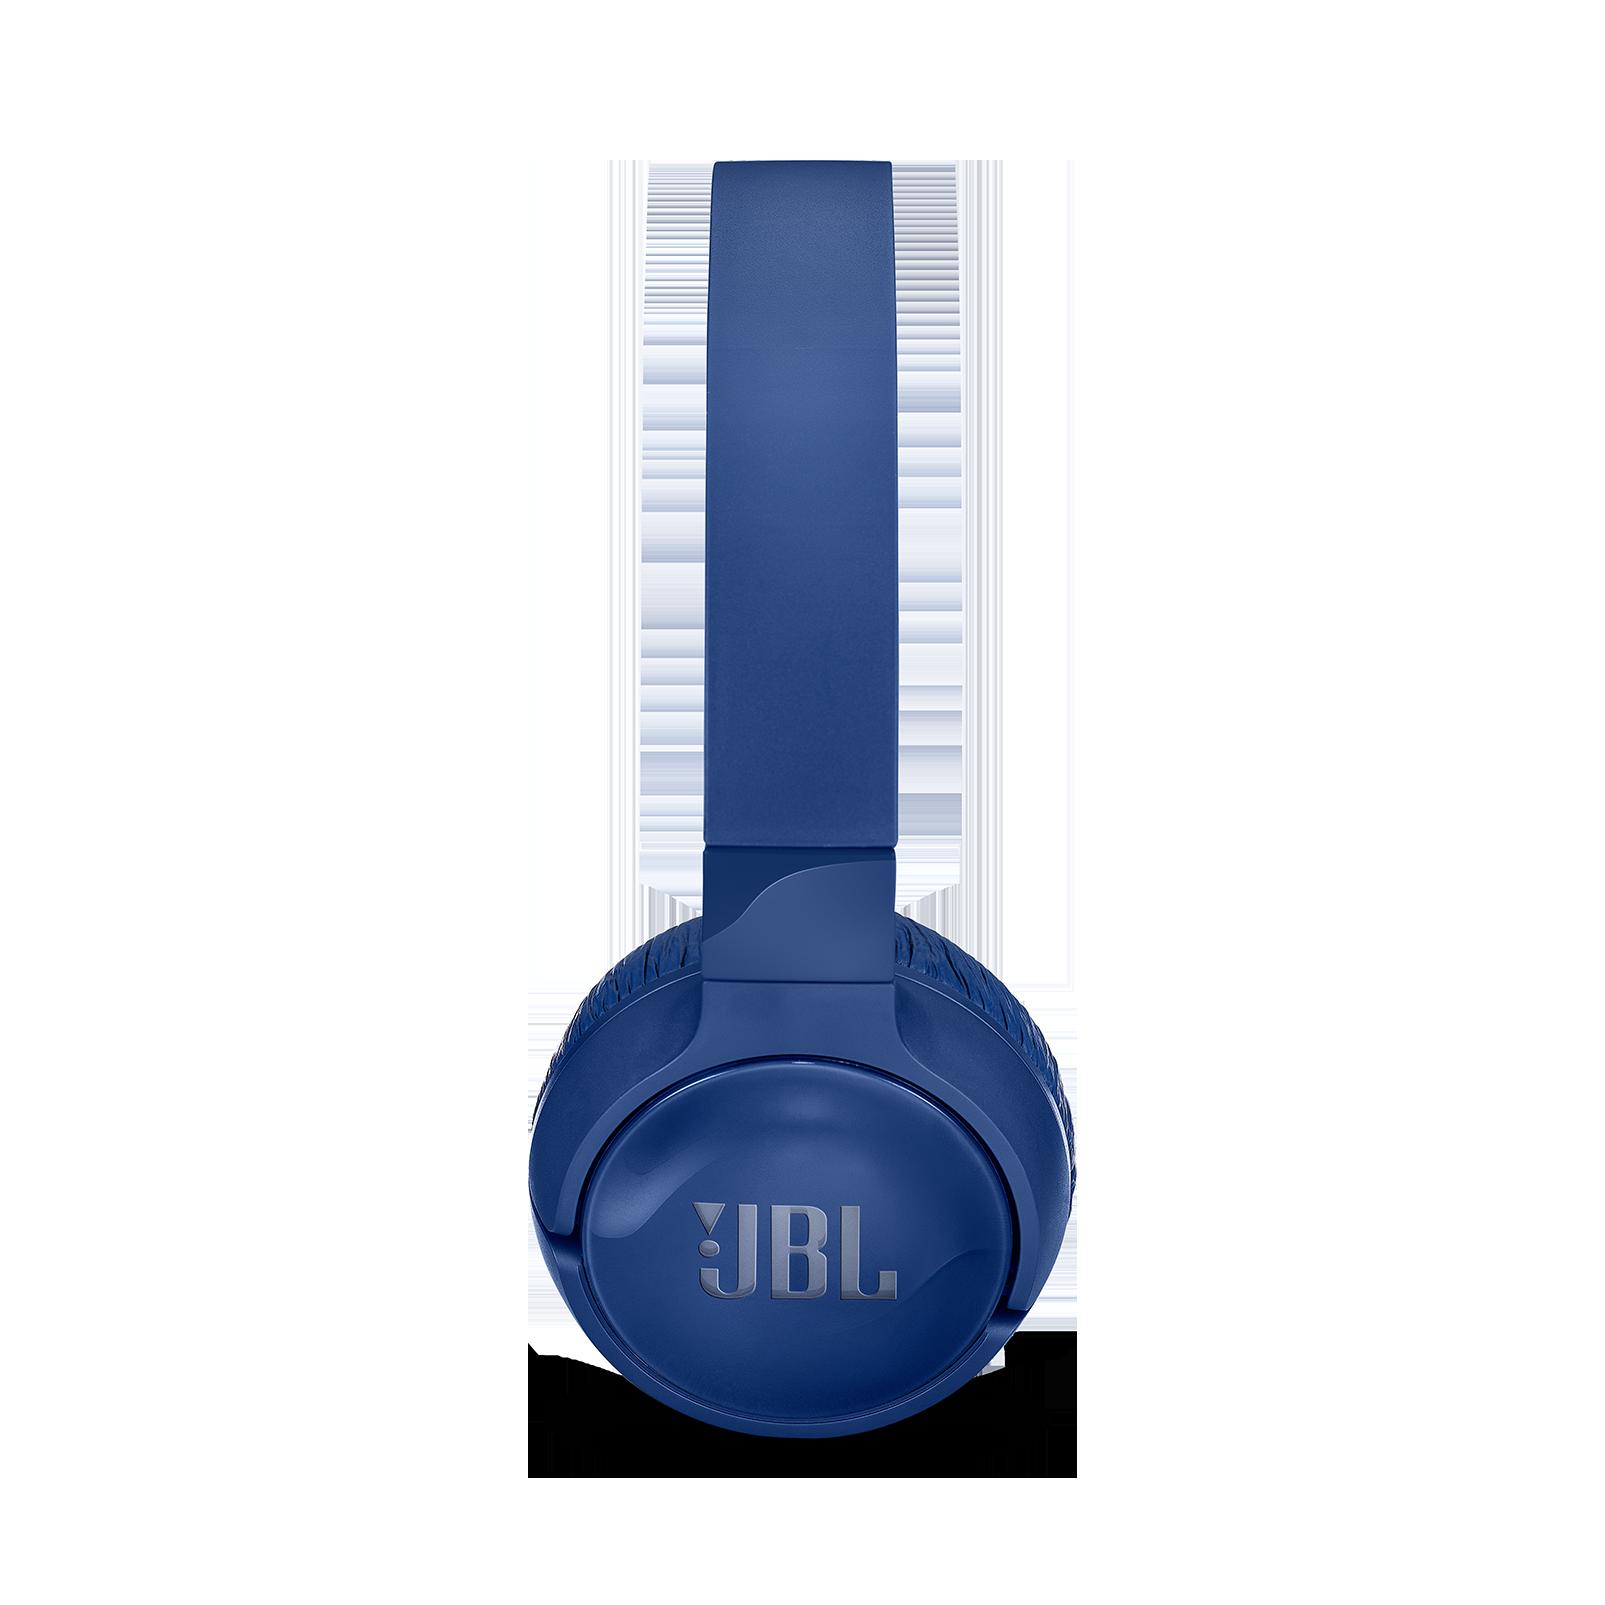 JBL TUNE 600BTNC - Blue - Wireless, on-ear, active noise-cancelling headphones. - Left